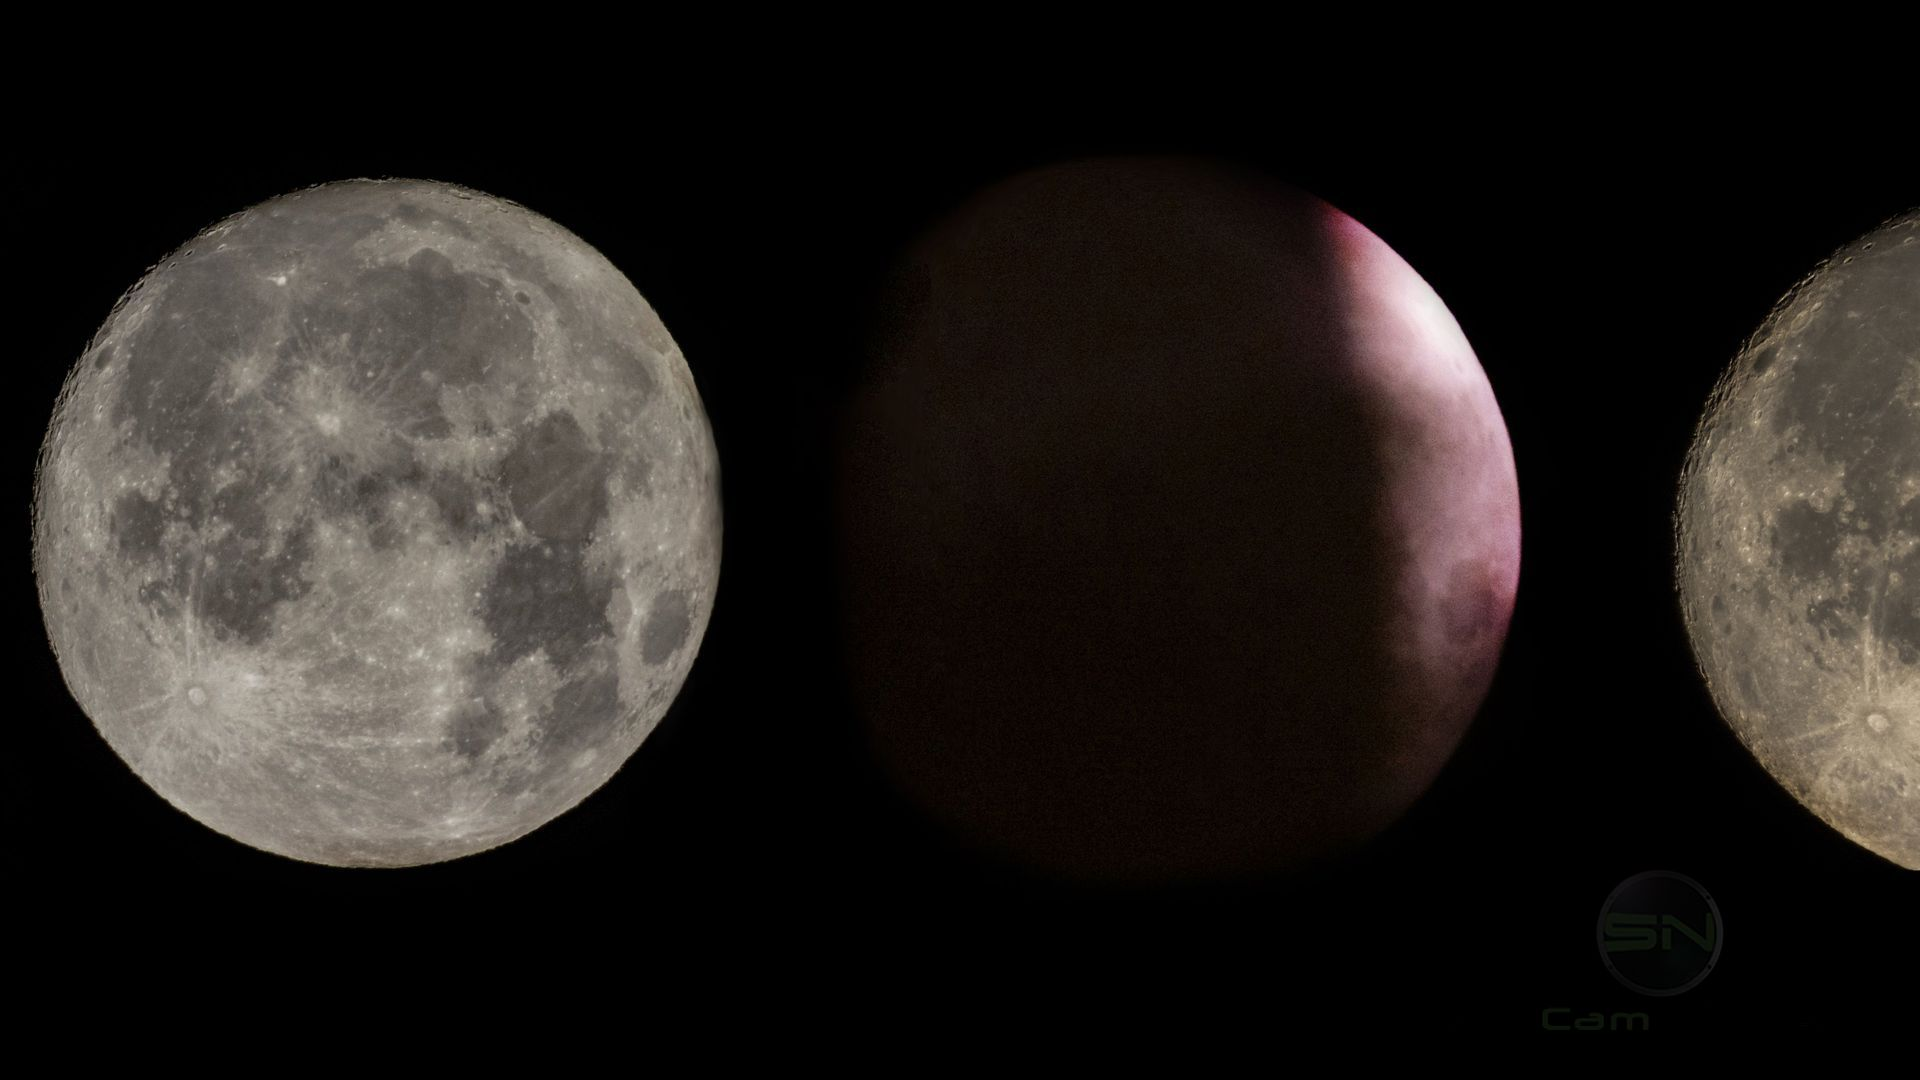 Blut Voll Mond 01_2019 - Nikon Coolpix P1000 - SmartCamNews